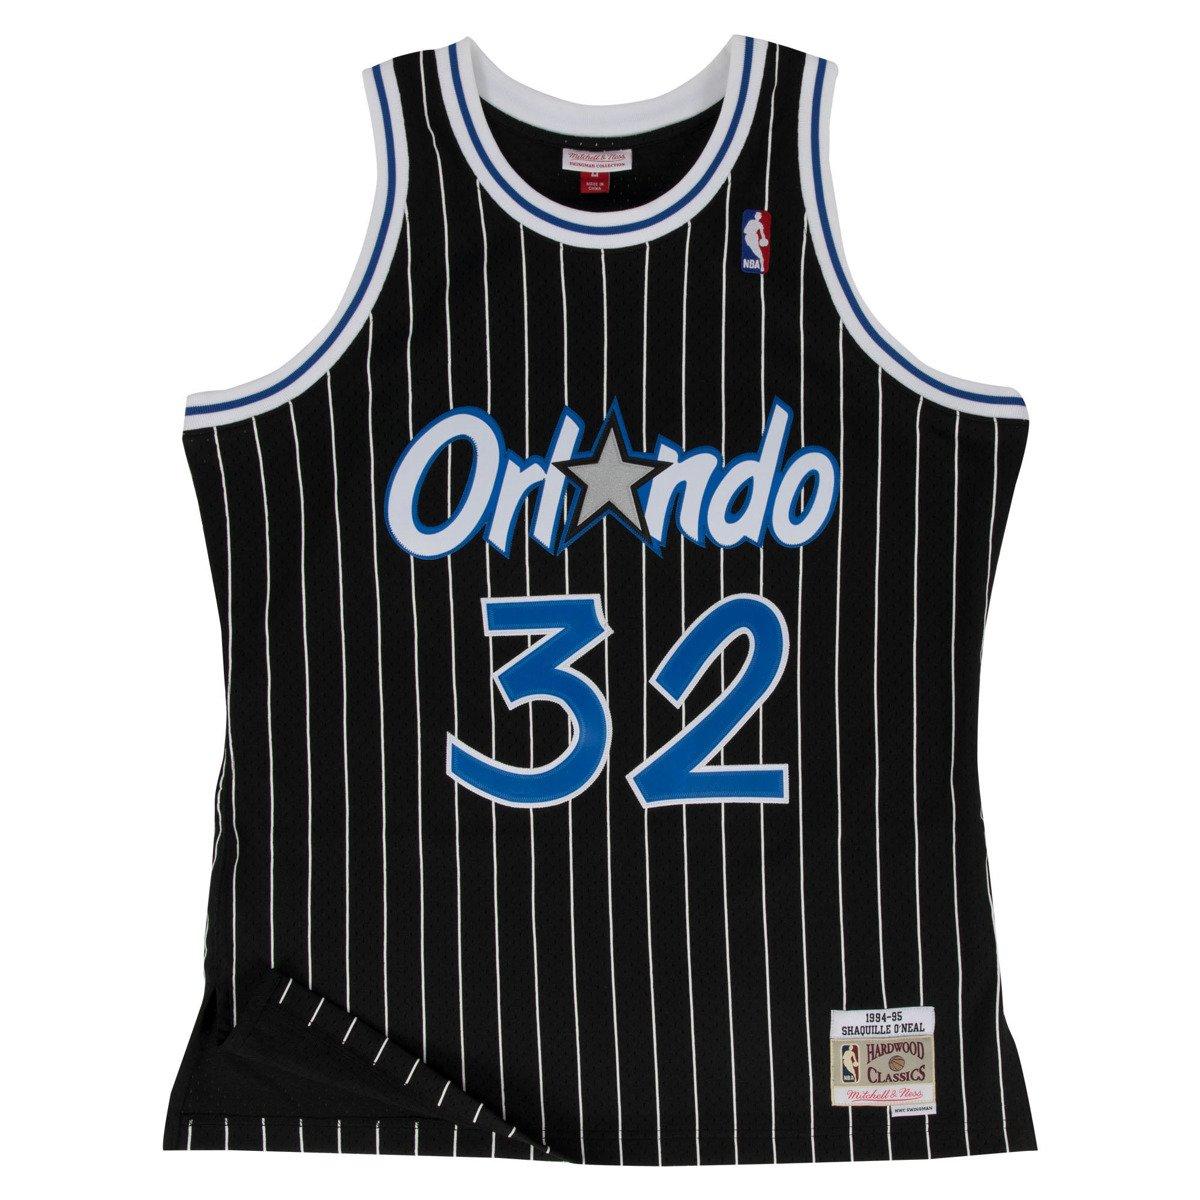 info for e5960 e2f45 Mitchell & Ness Shaquille O'Neal 1994-95 NBA Hardwood Classics Swingman  Orlando Magic Jersey